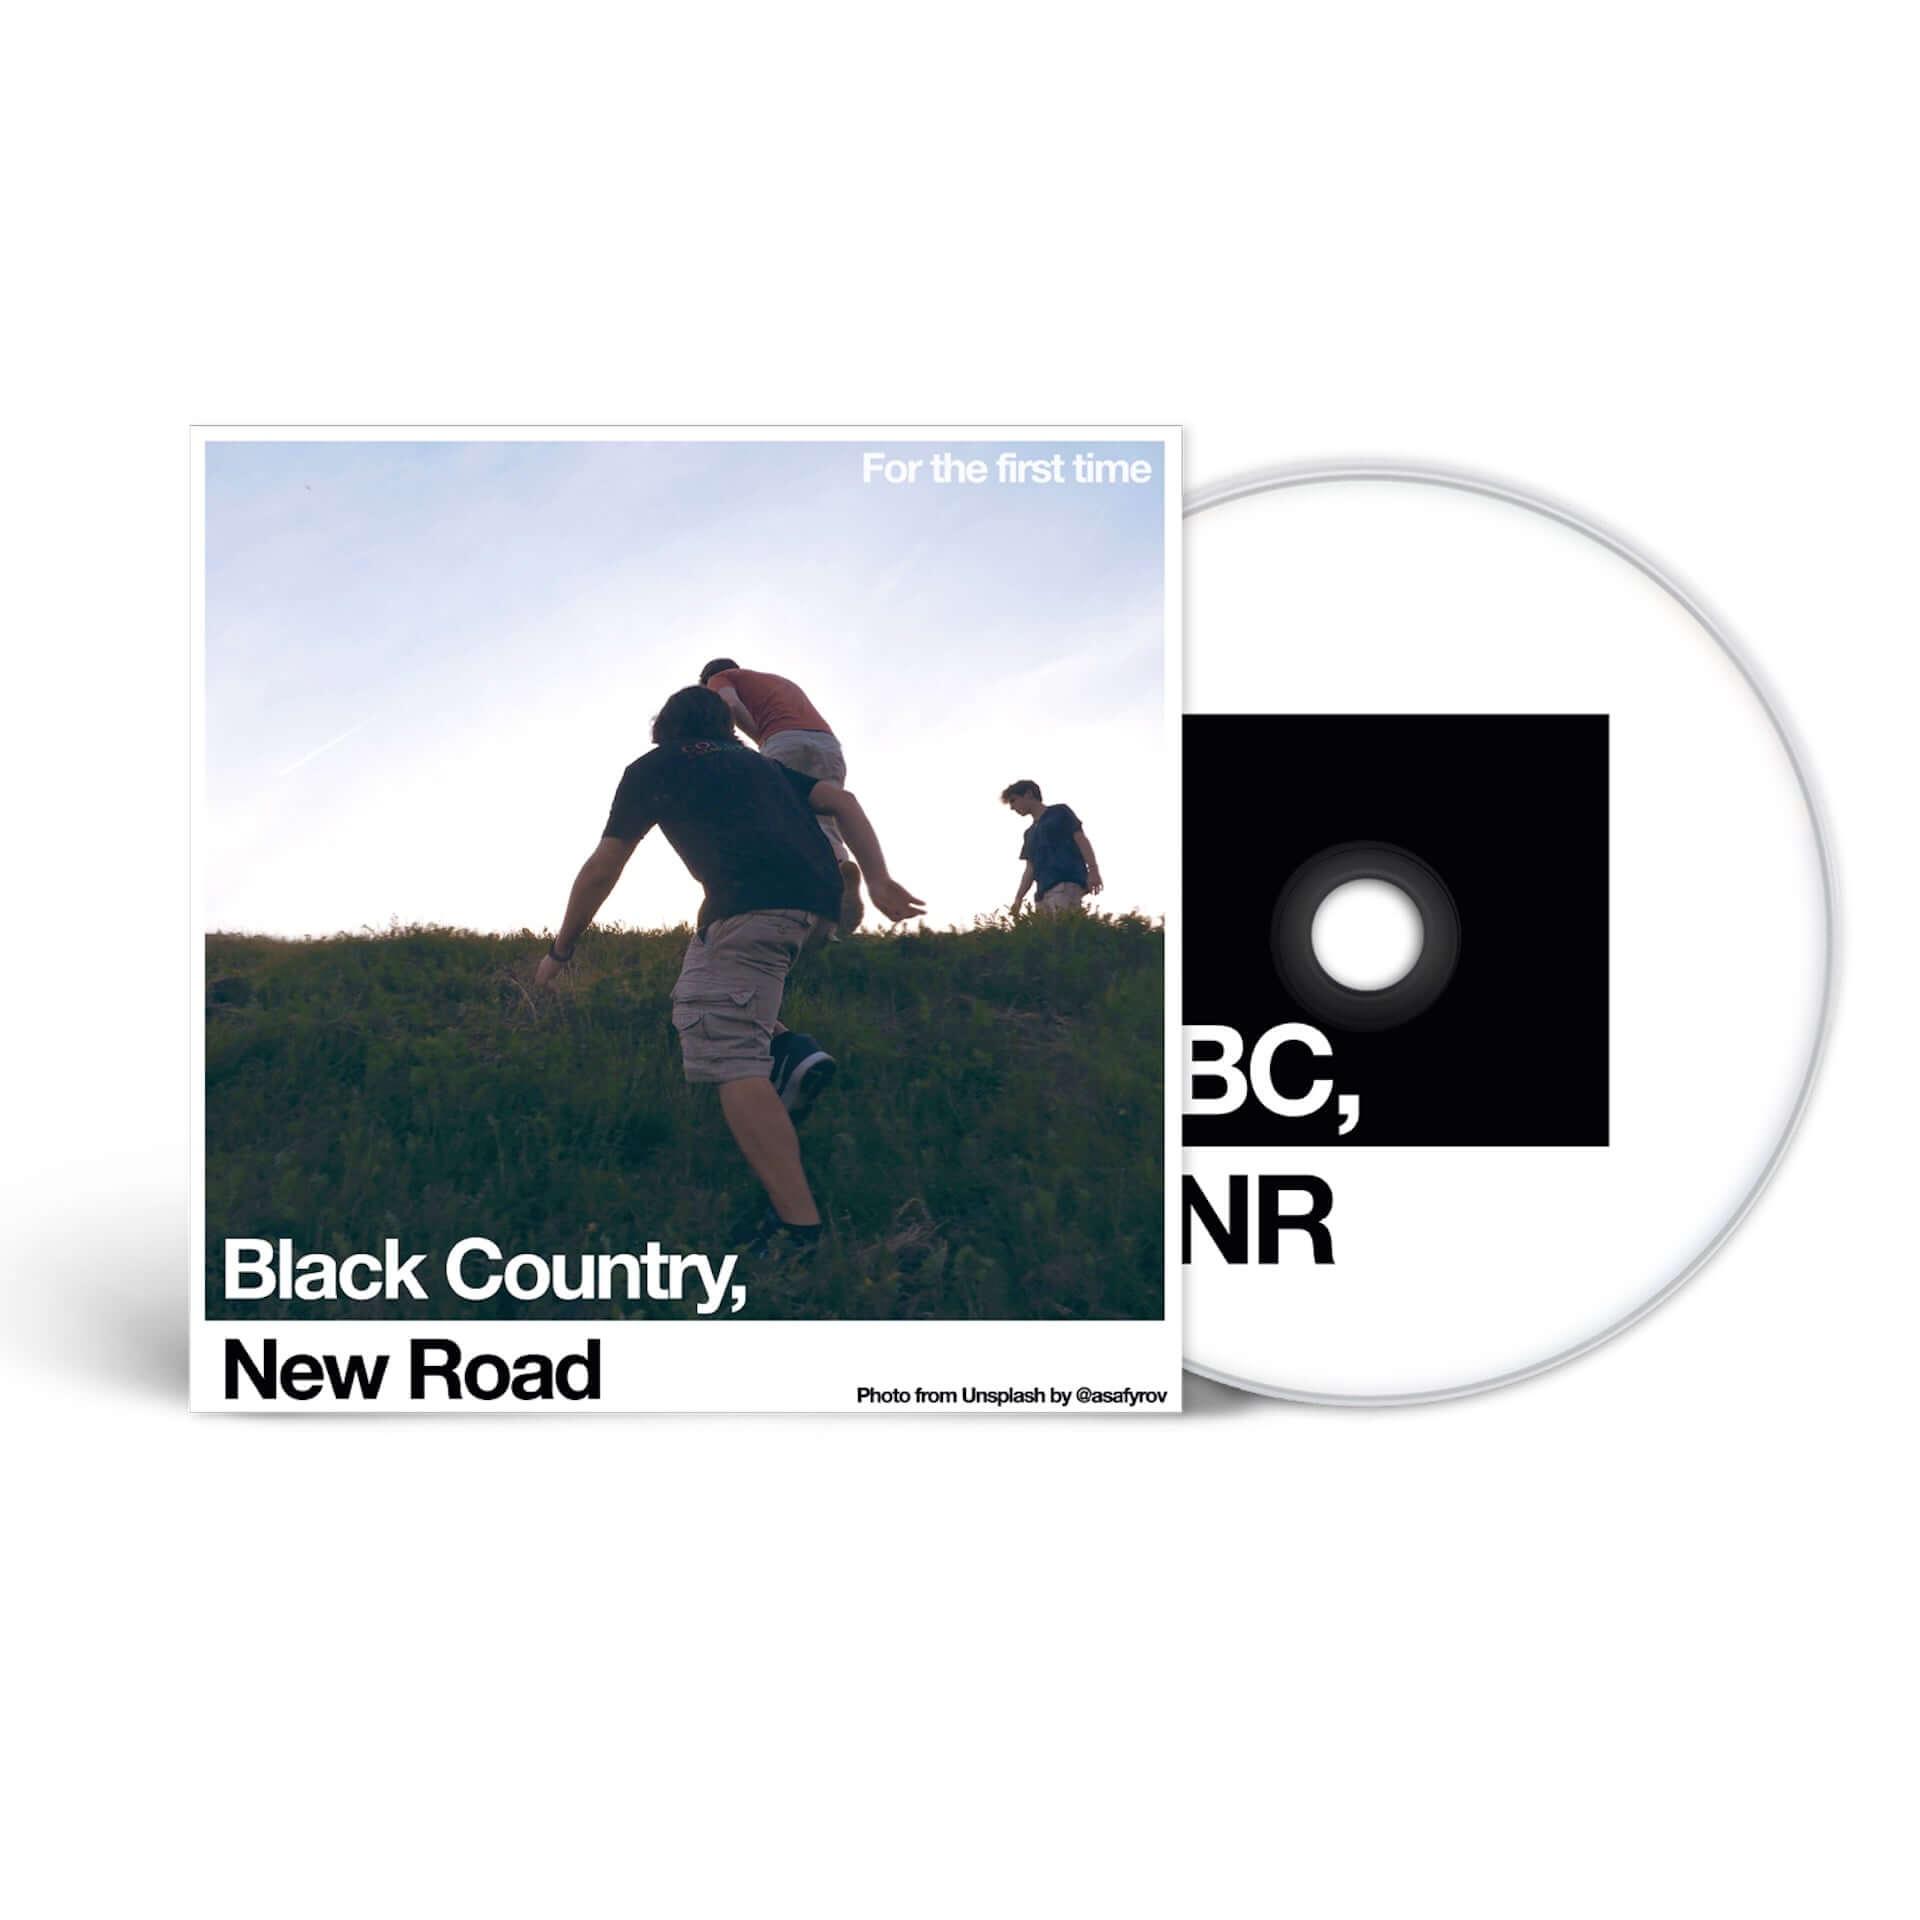 black midiとBlack Country, New Roadがコラボ!24時間限定のライブ配信がBandcampにて実施決定 music201209_blackmidi-bcnr_9-1920x1920